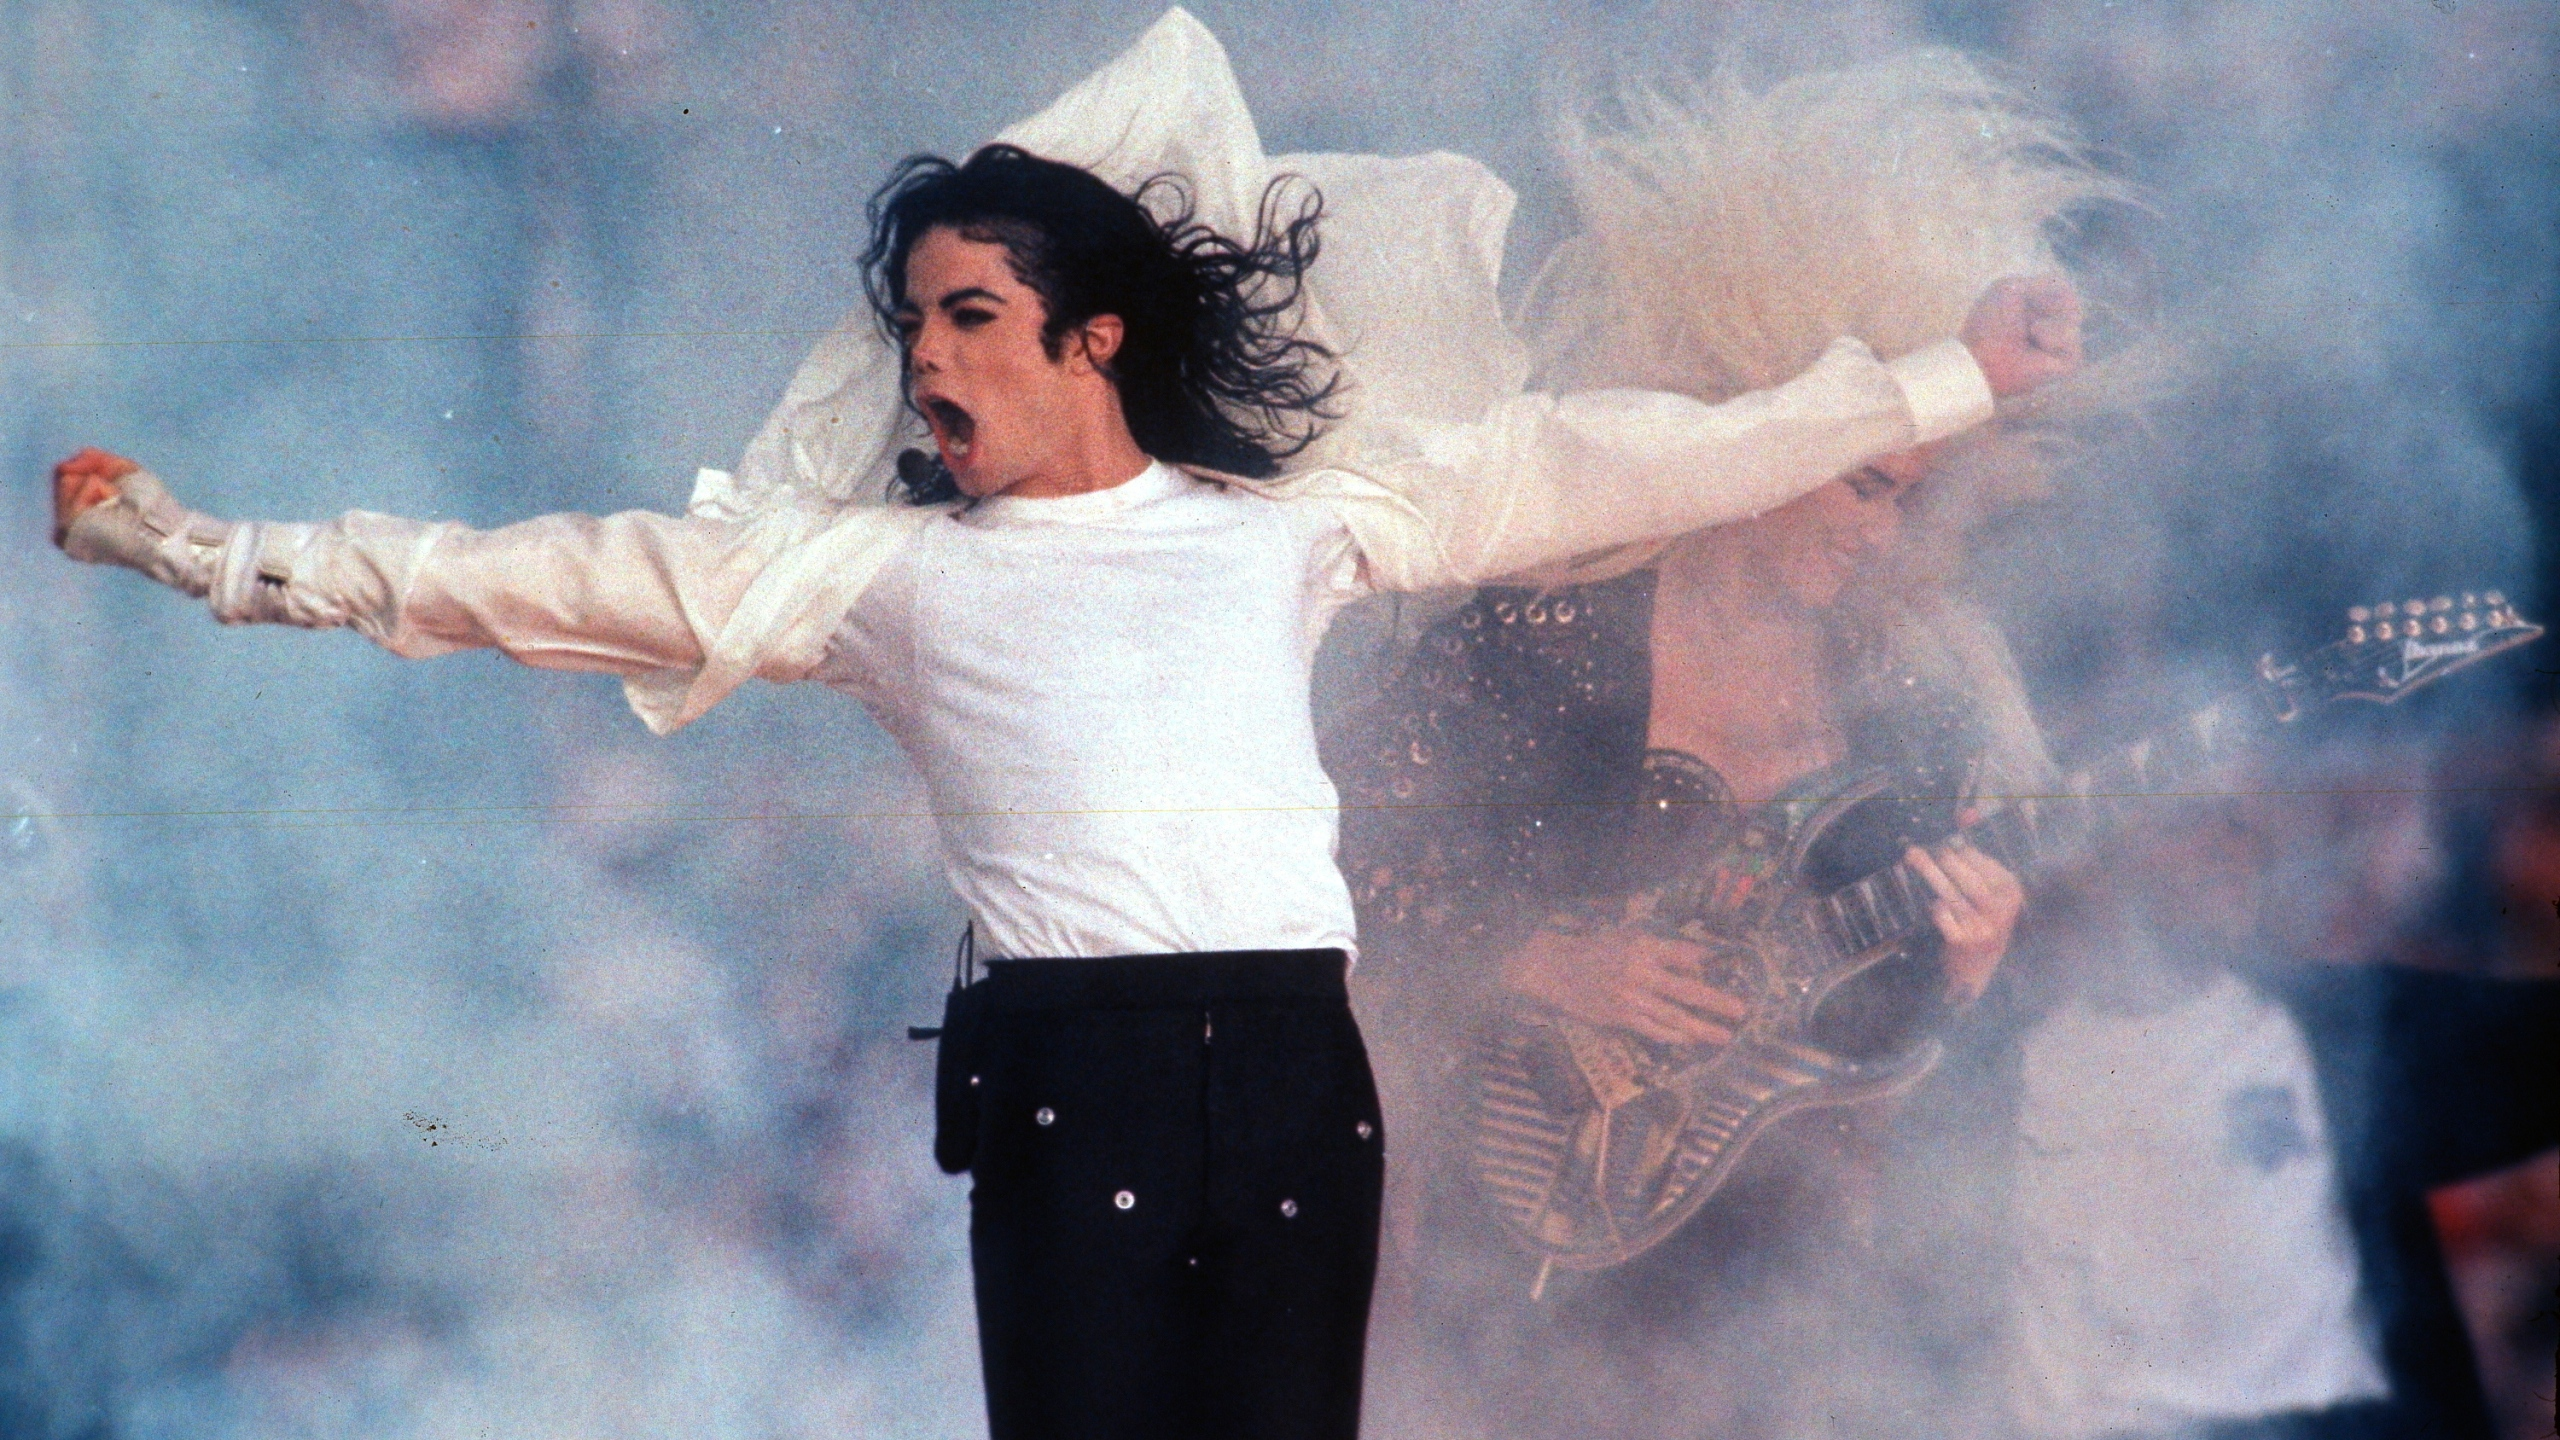 Michael_Jackson_Musical_09733-159532.jpg47852625